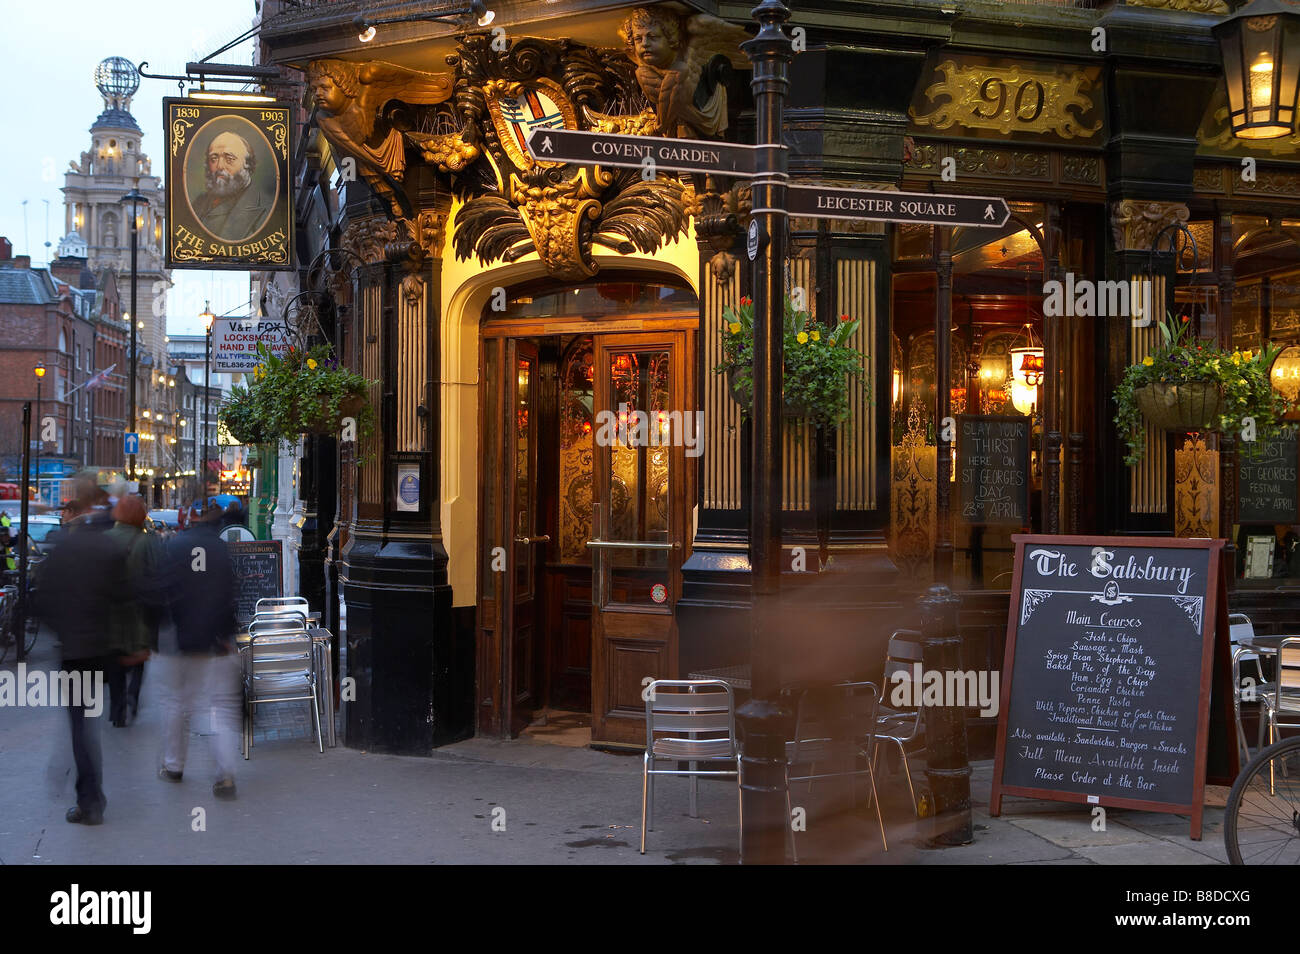 The Globe Pub London Stock Photos & The Globe Pub London Stock ...